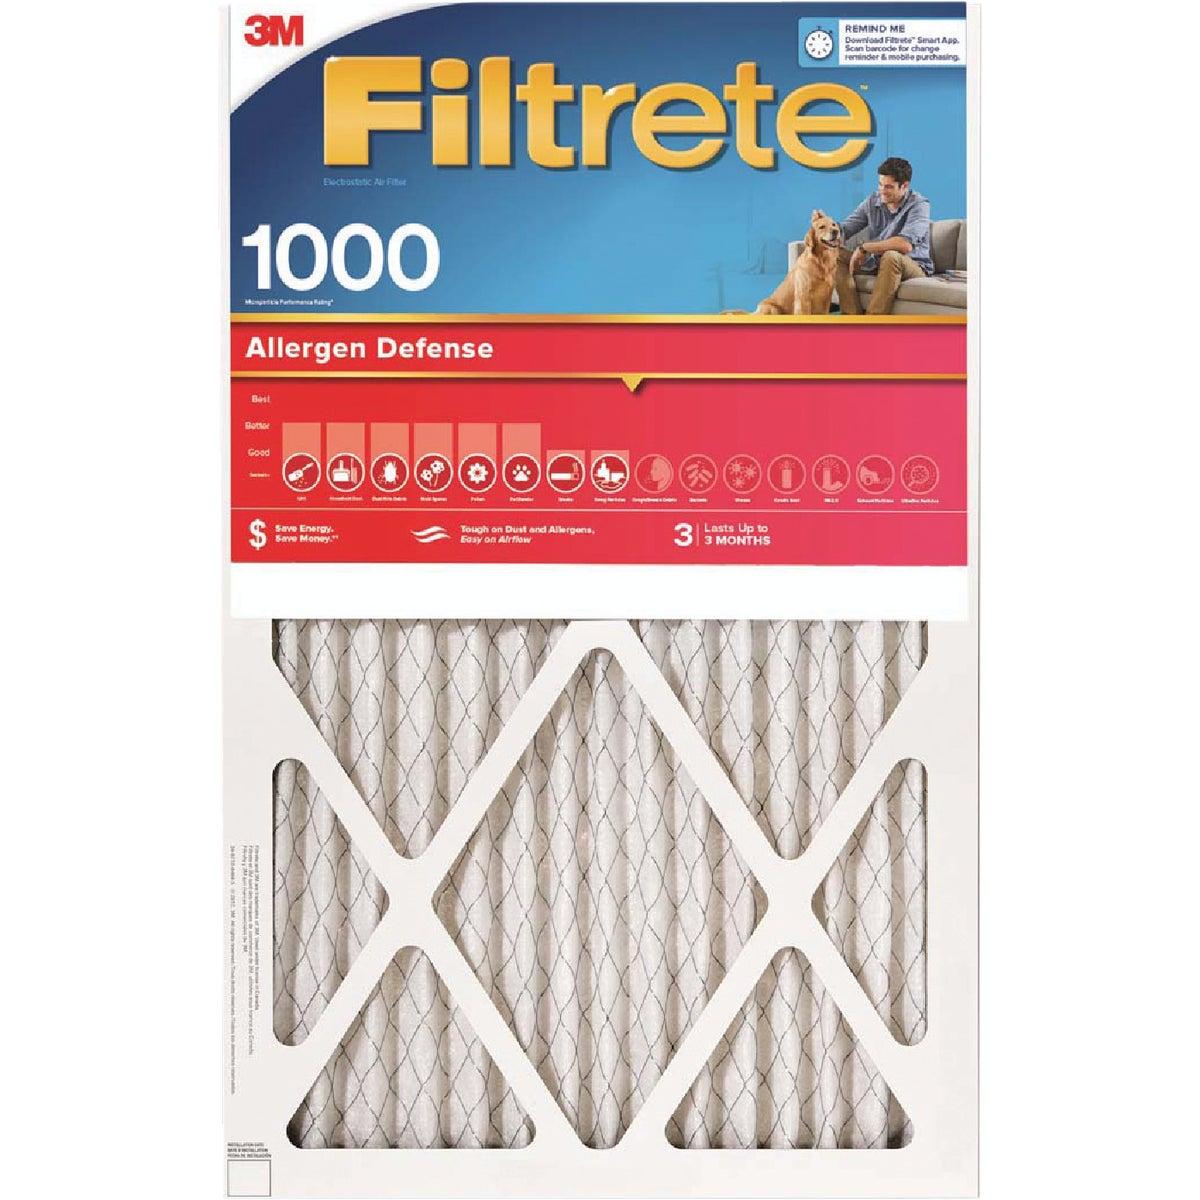 3M Filtrete 14 In. x 25 In. x 1 In. Allergen Defense 1000/1085 MPR Furnace Filter